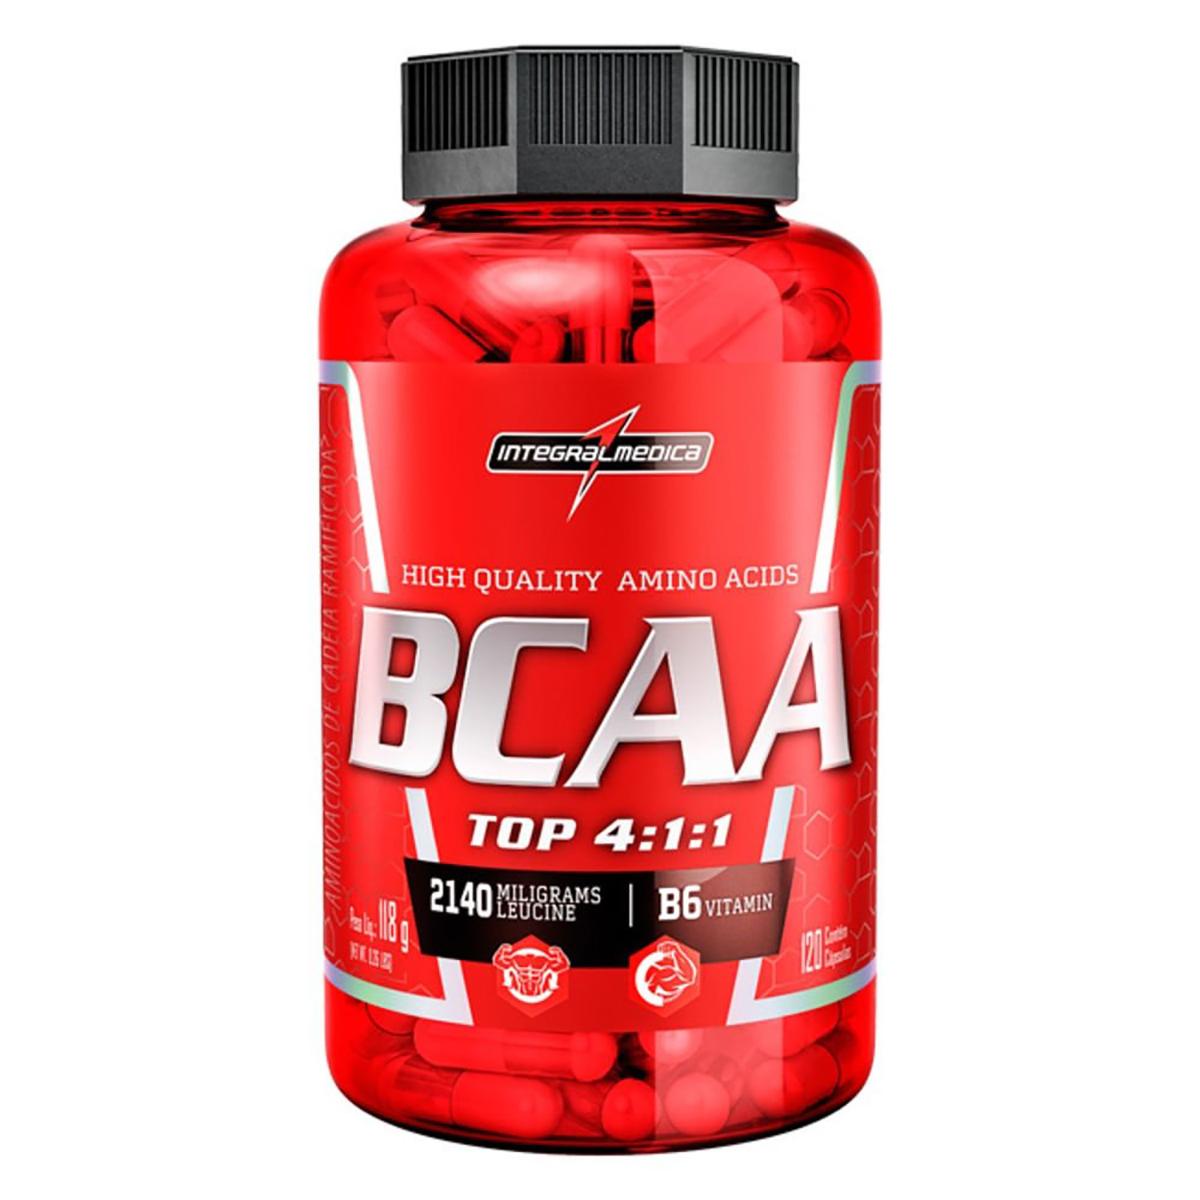 BCAA Top 4.1.1 2140 mg Integralmédica - 120 Cápsulas